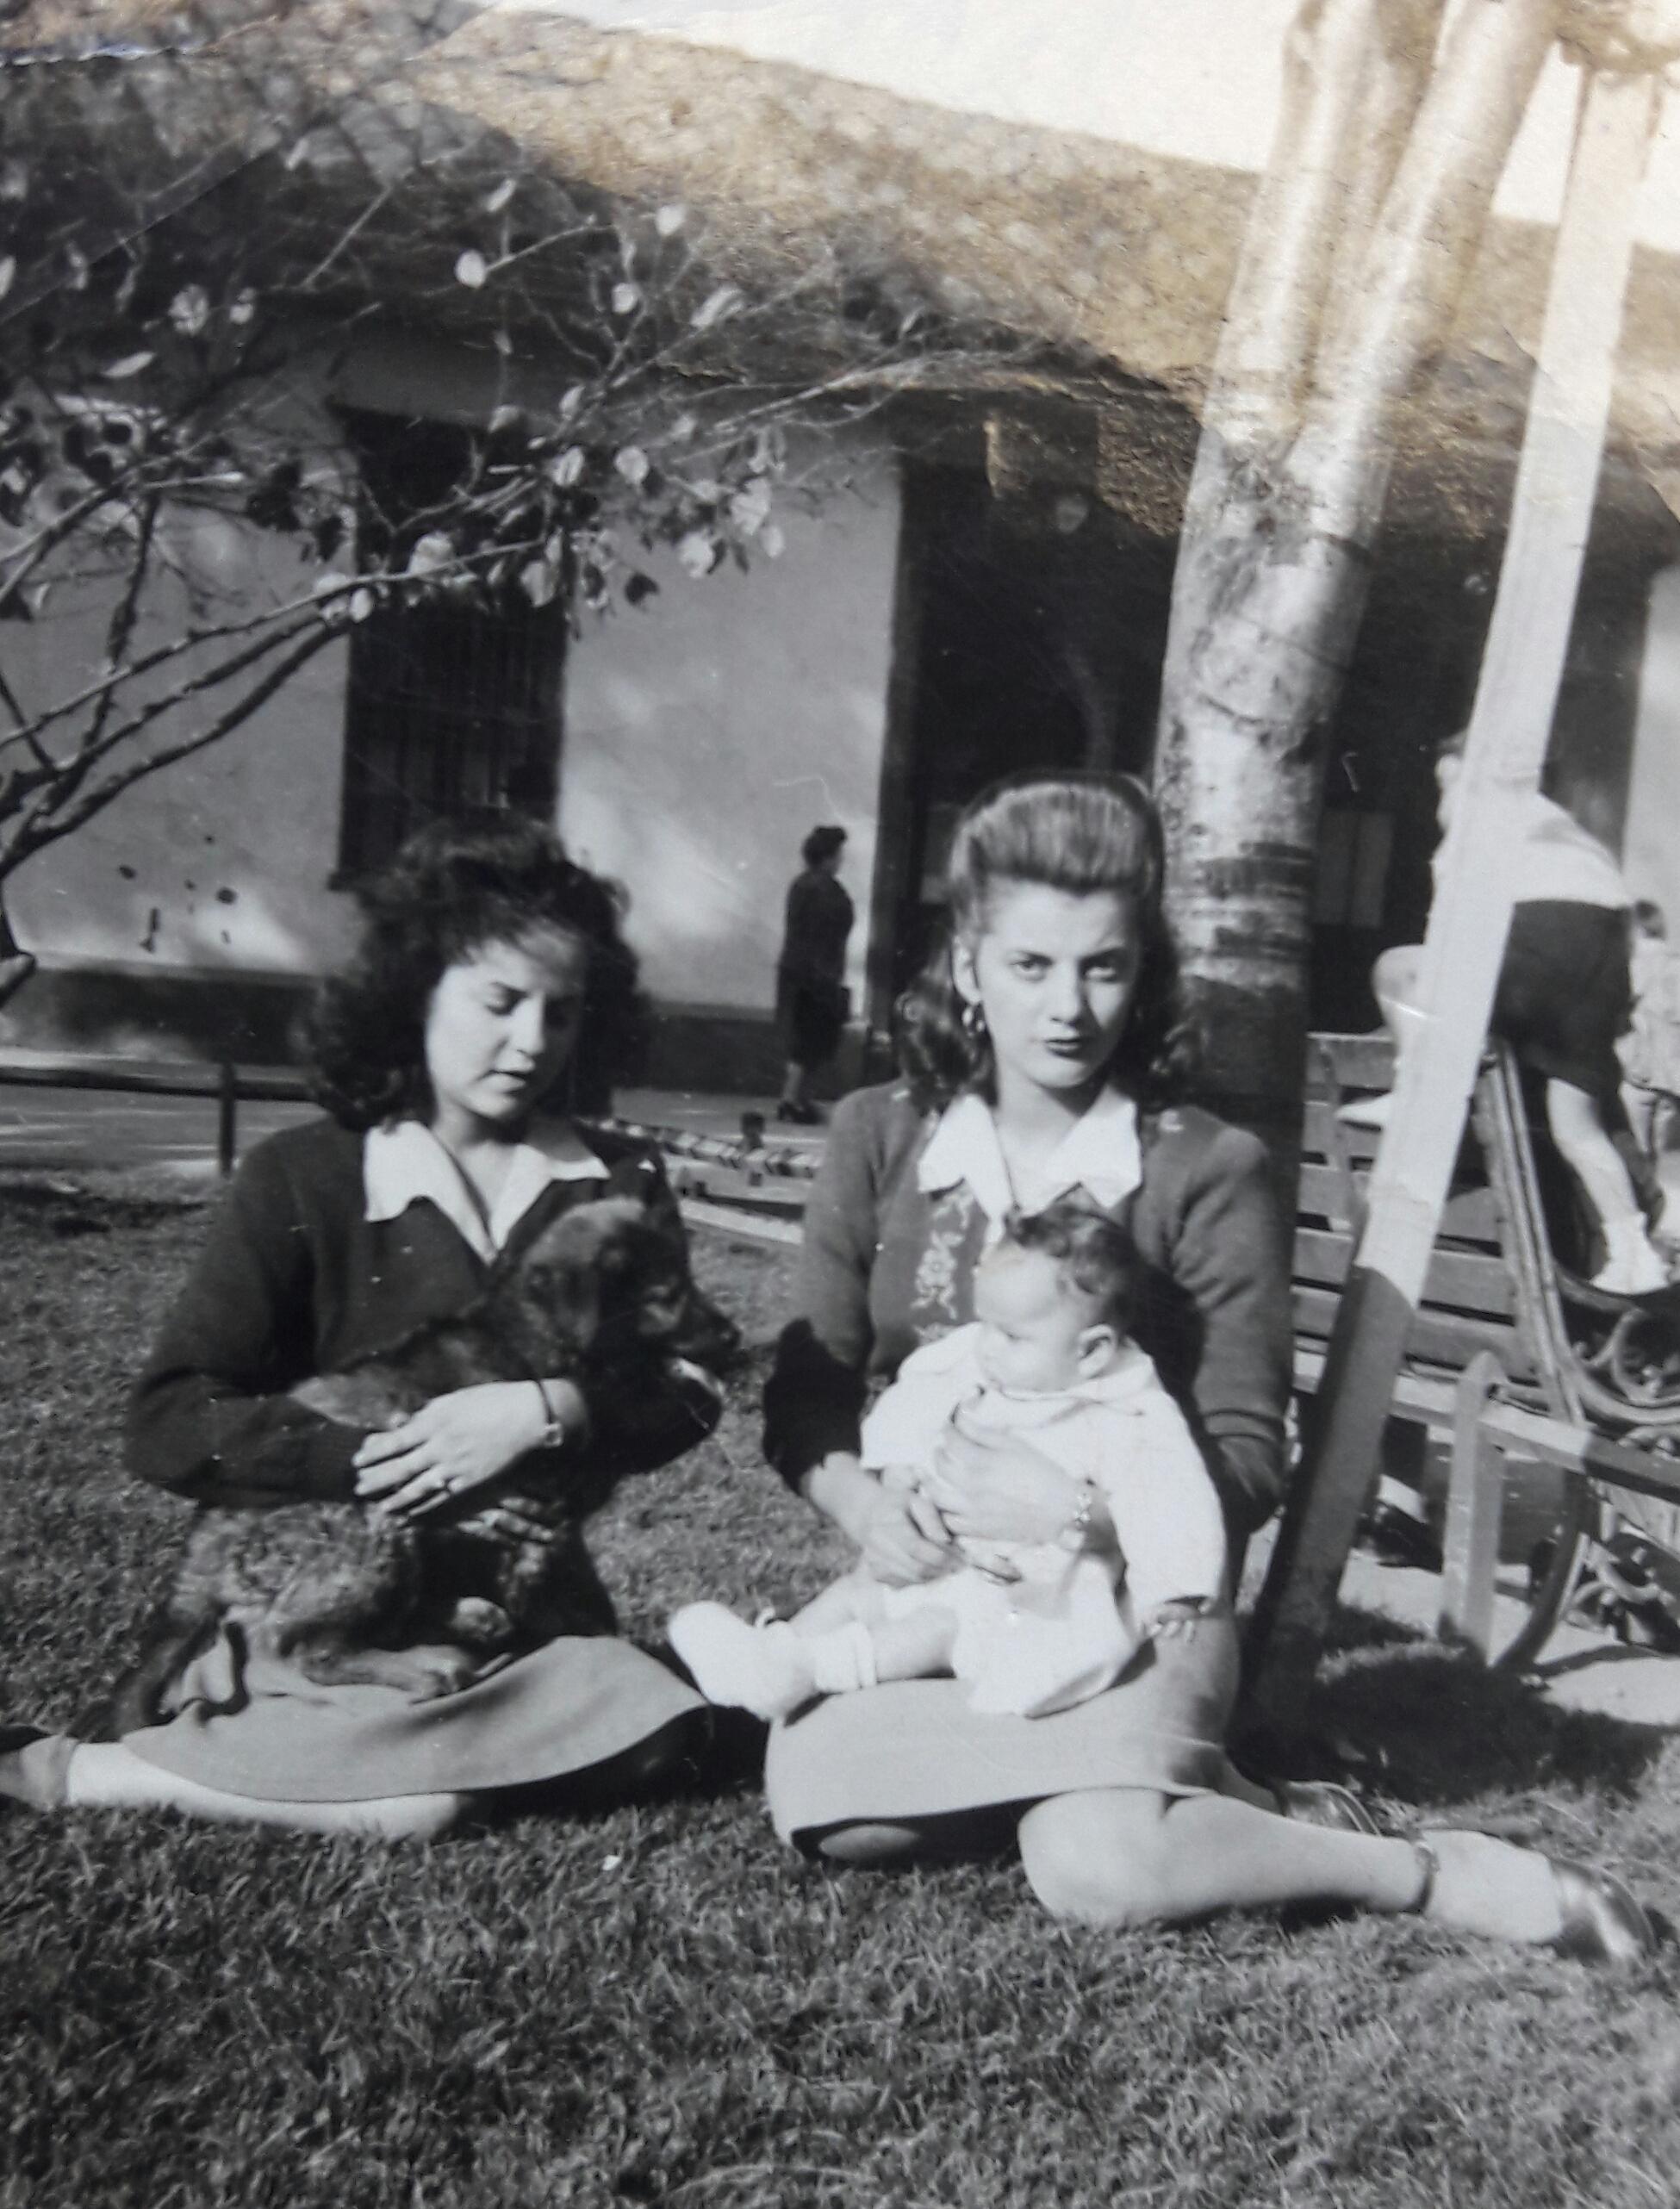 Enterreno - Fotos históricas de chile - fotos antiguas de Chile - Costa Restaurante, 1941